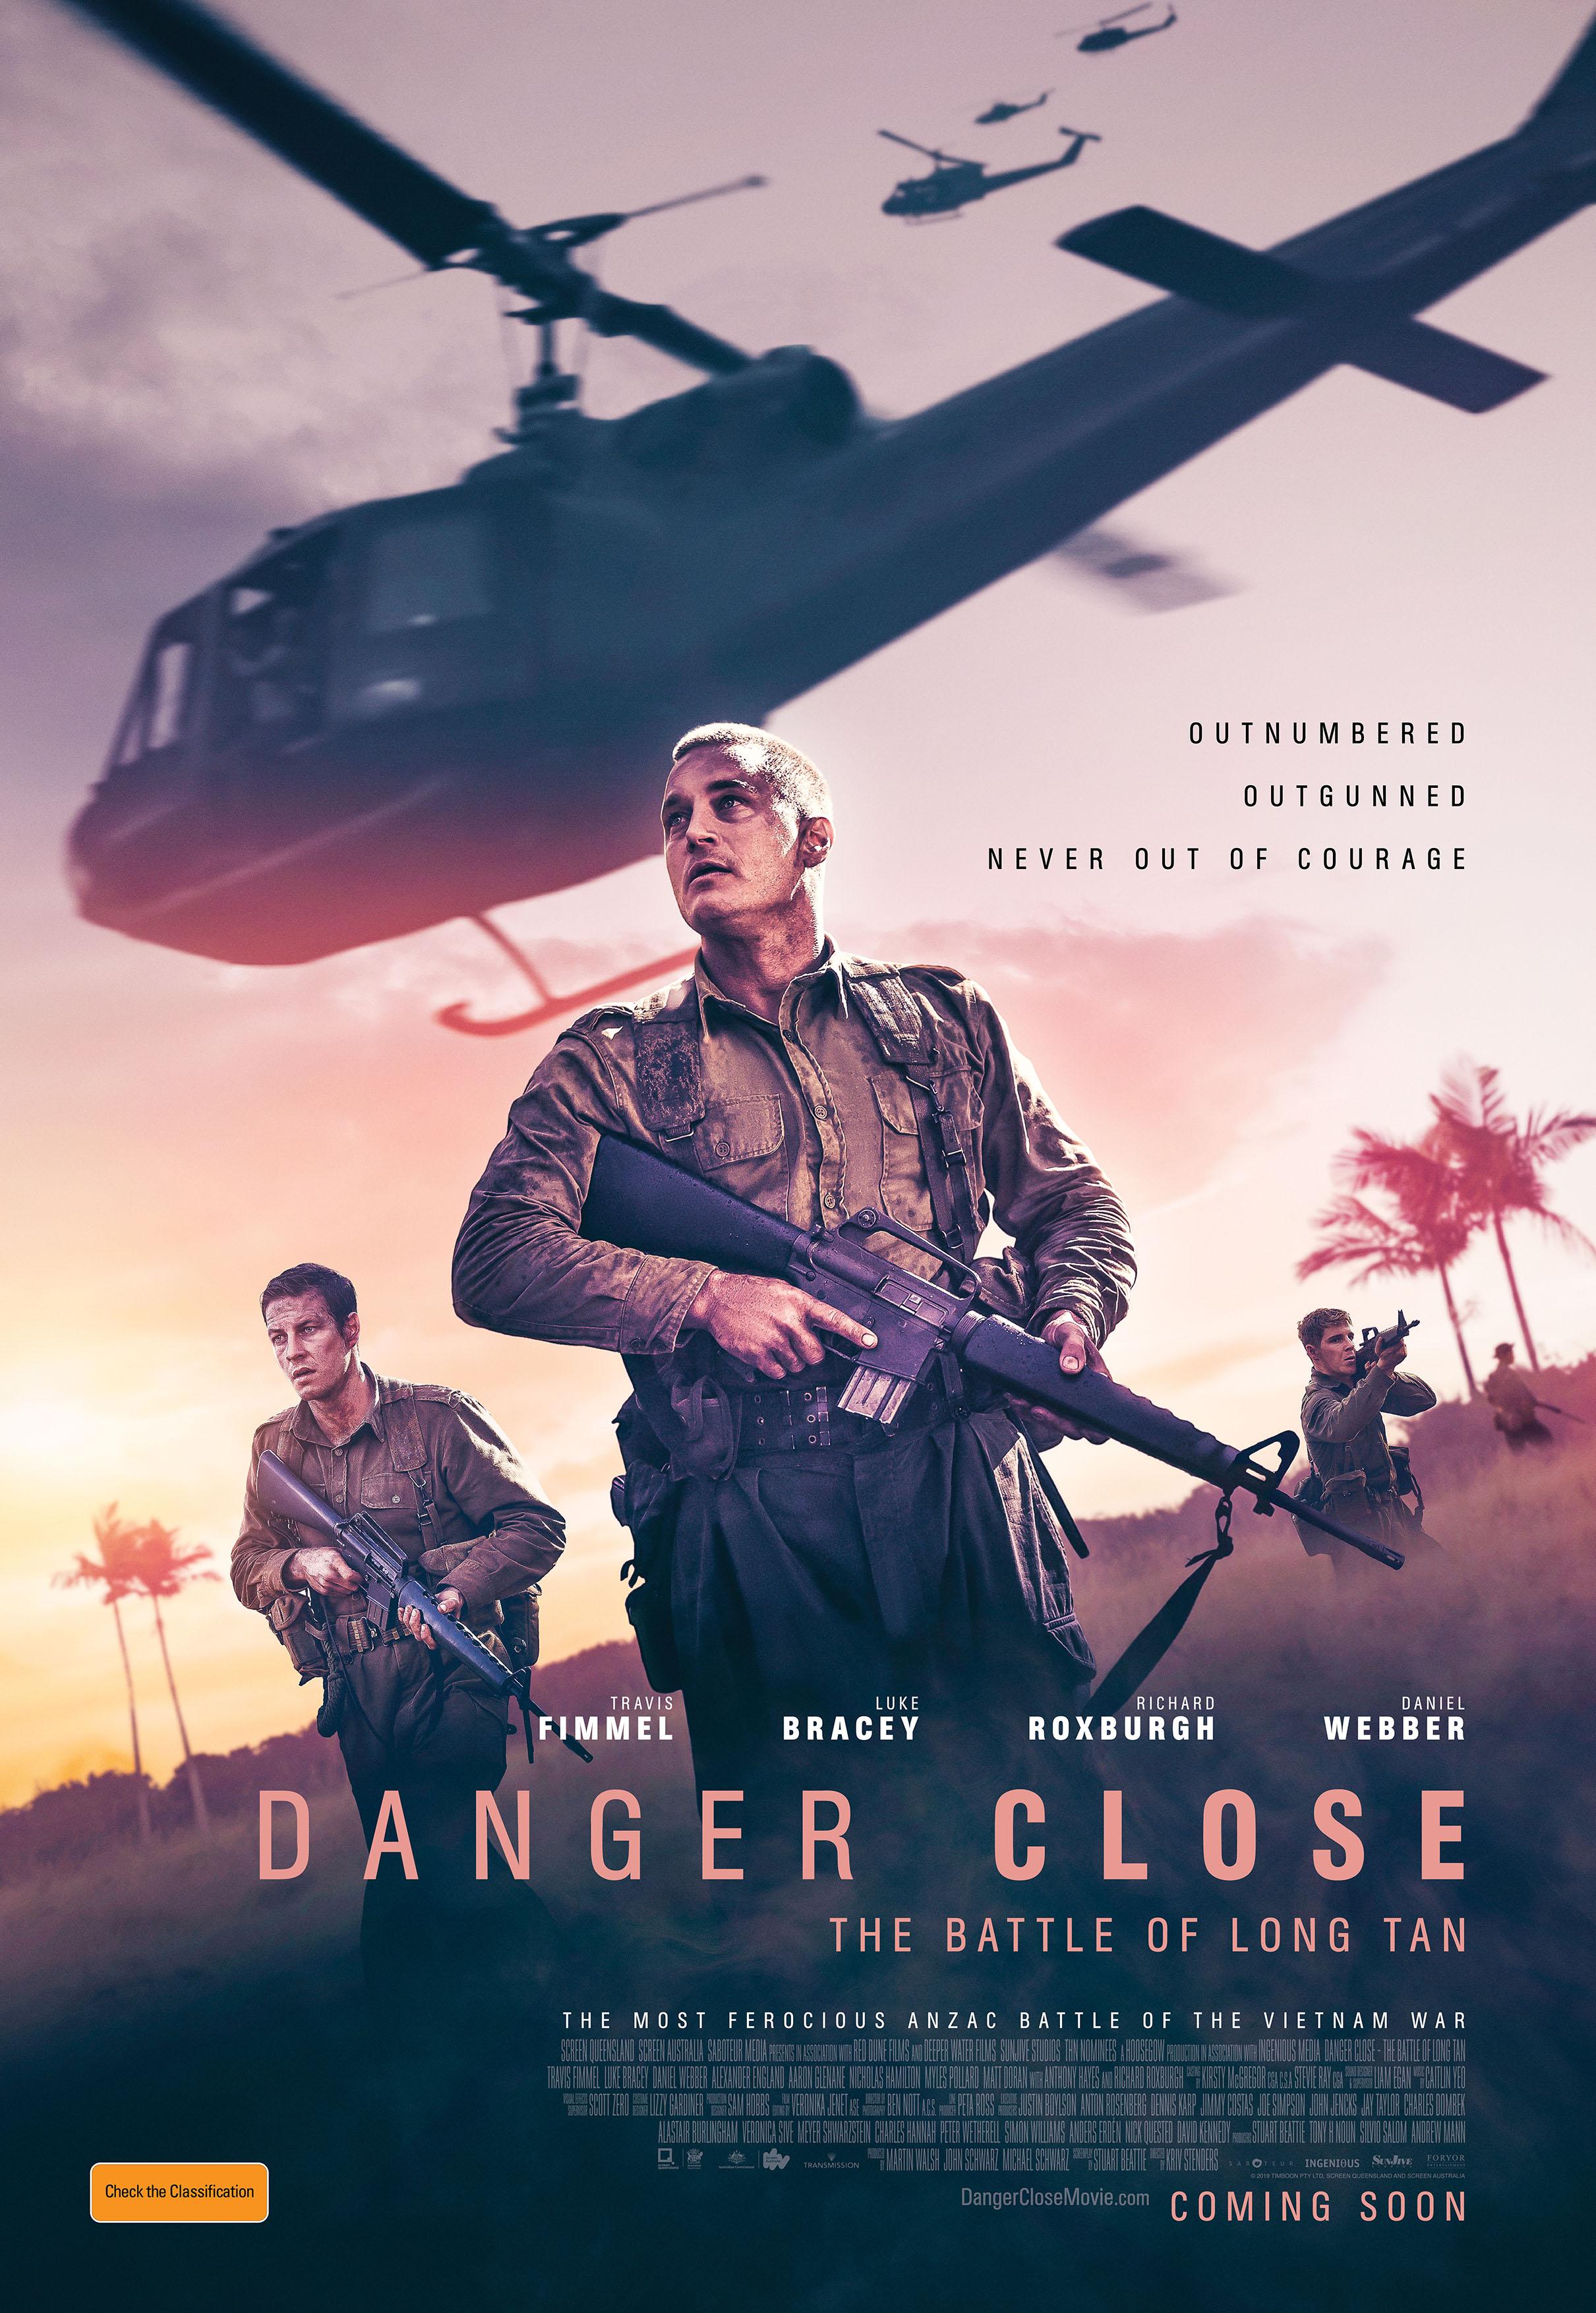 Danger Close: The Battle of Long Tan (2019) - IMDb